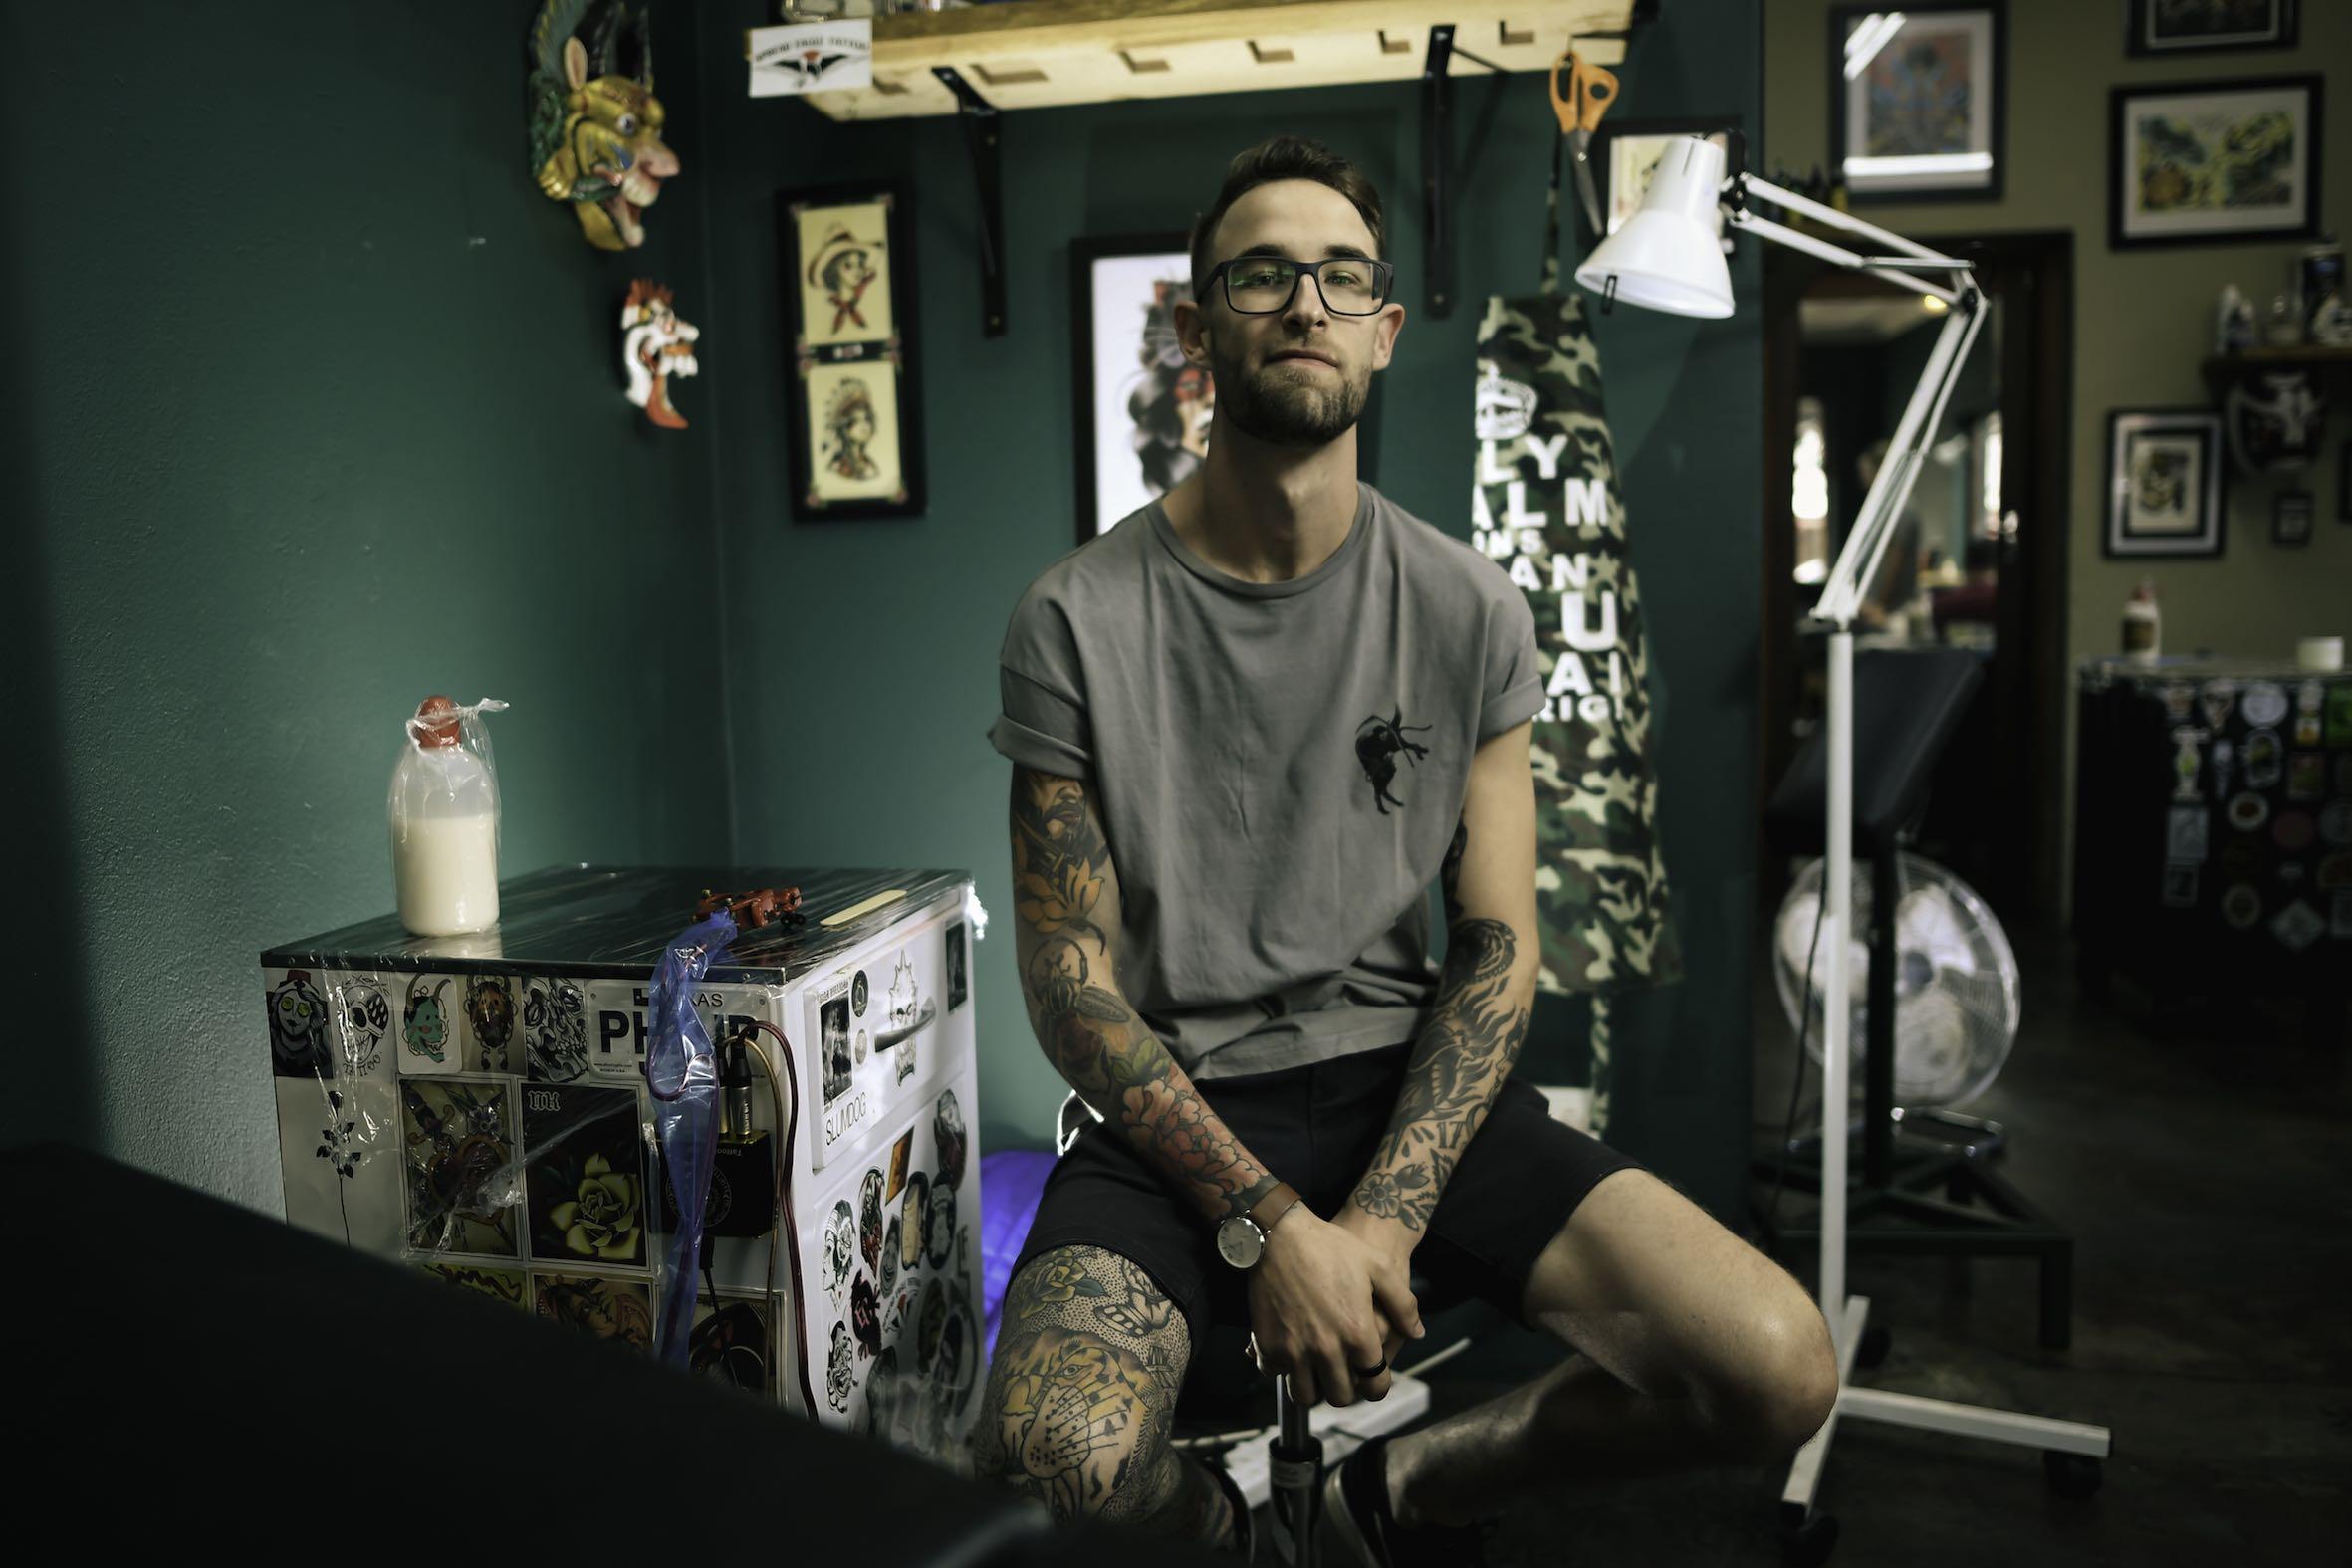 Meet Phillip Wells as our Tattoo Artist of the Week